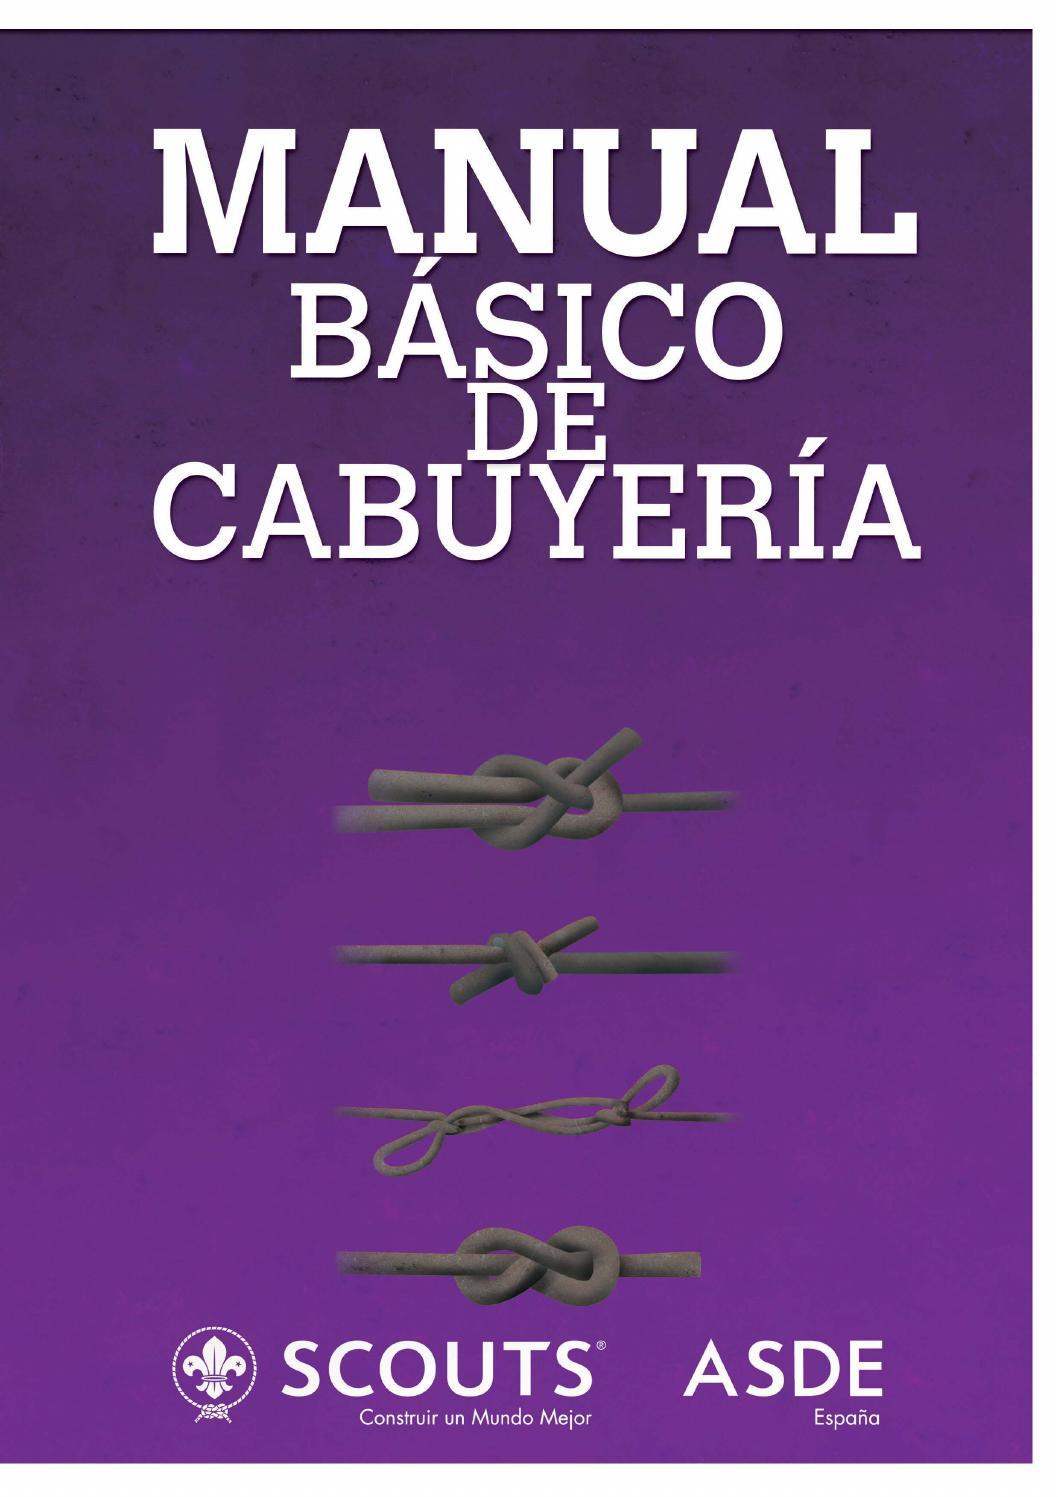 Manual b sico de cabuyer a by scouts de espa a issuu for Manual de construccion de albercas pdf